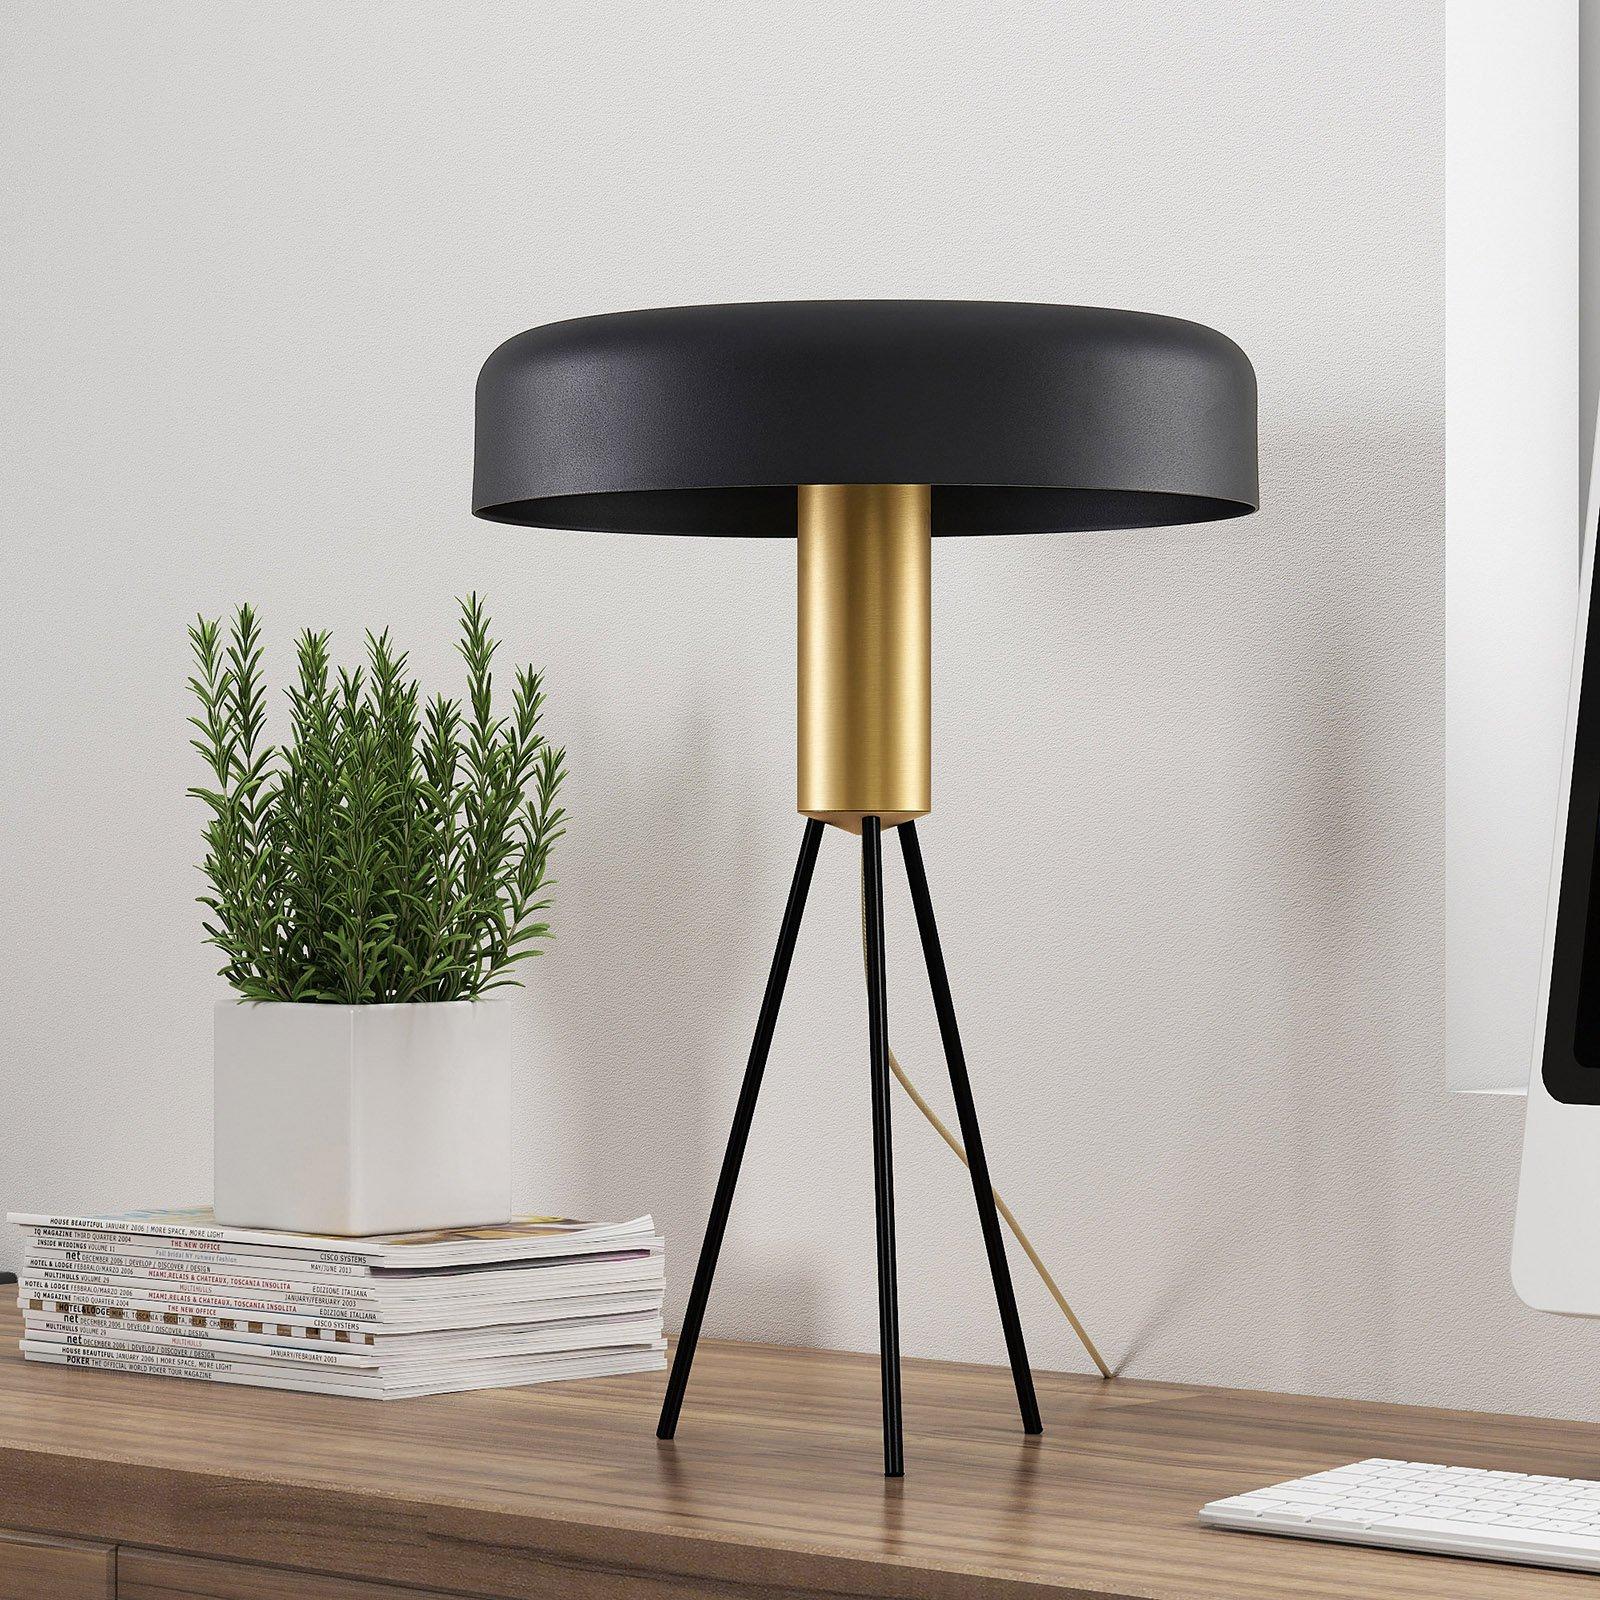 Lucande Filoreta bordlampe i svart